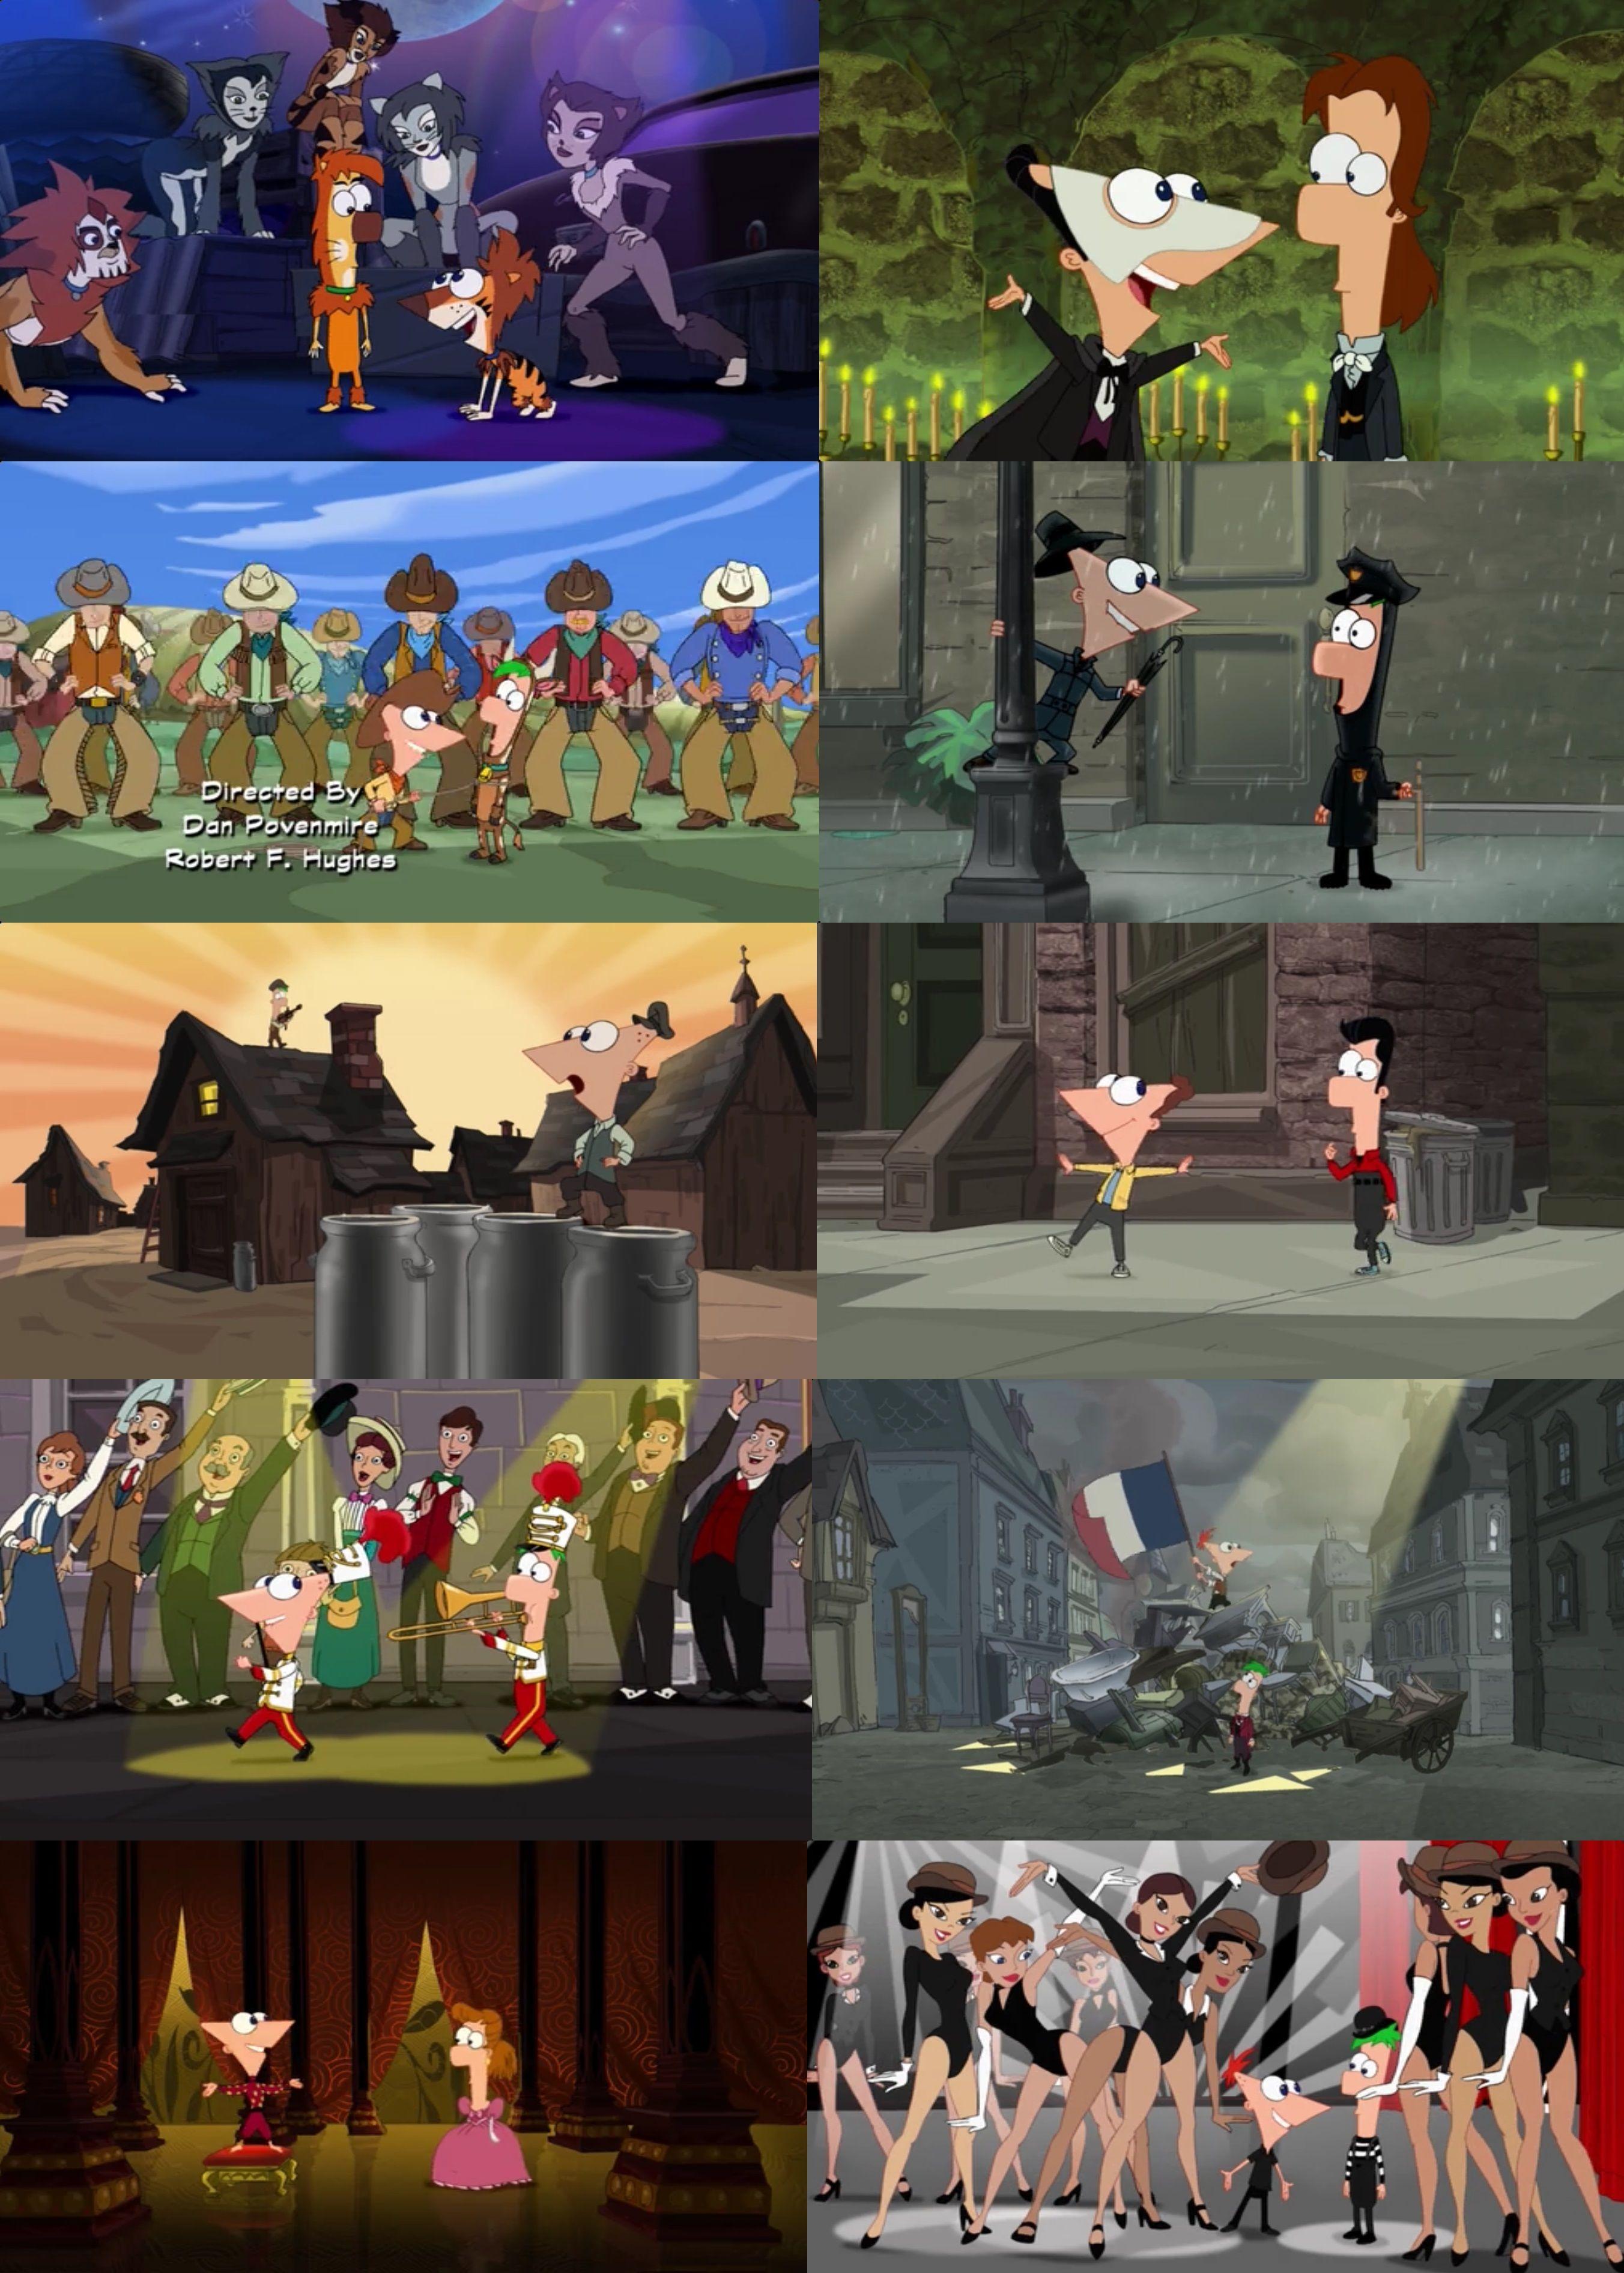 Phineas & Ferb's interpretation of classic musicals This